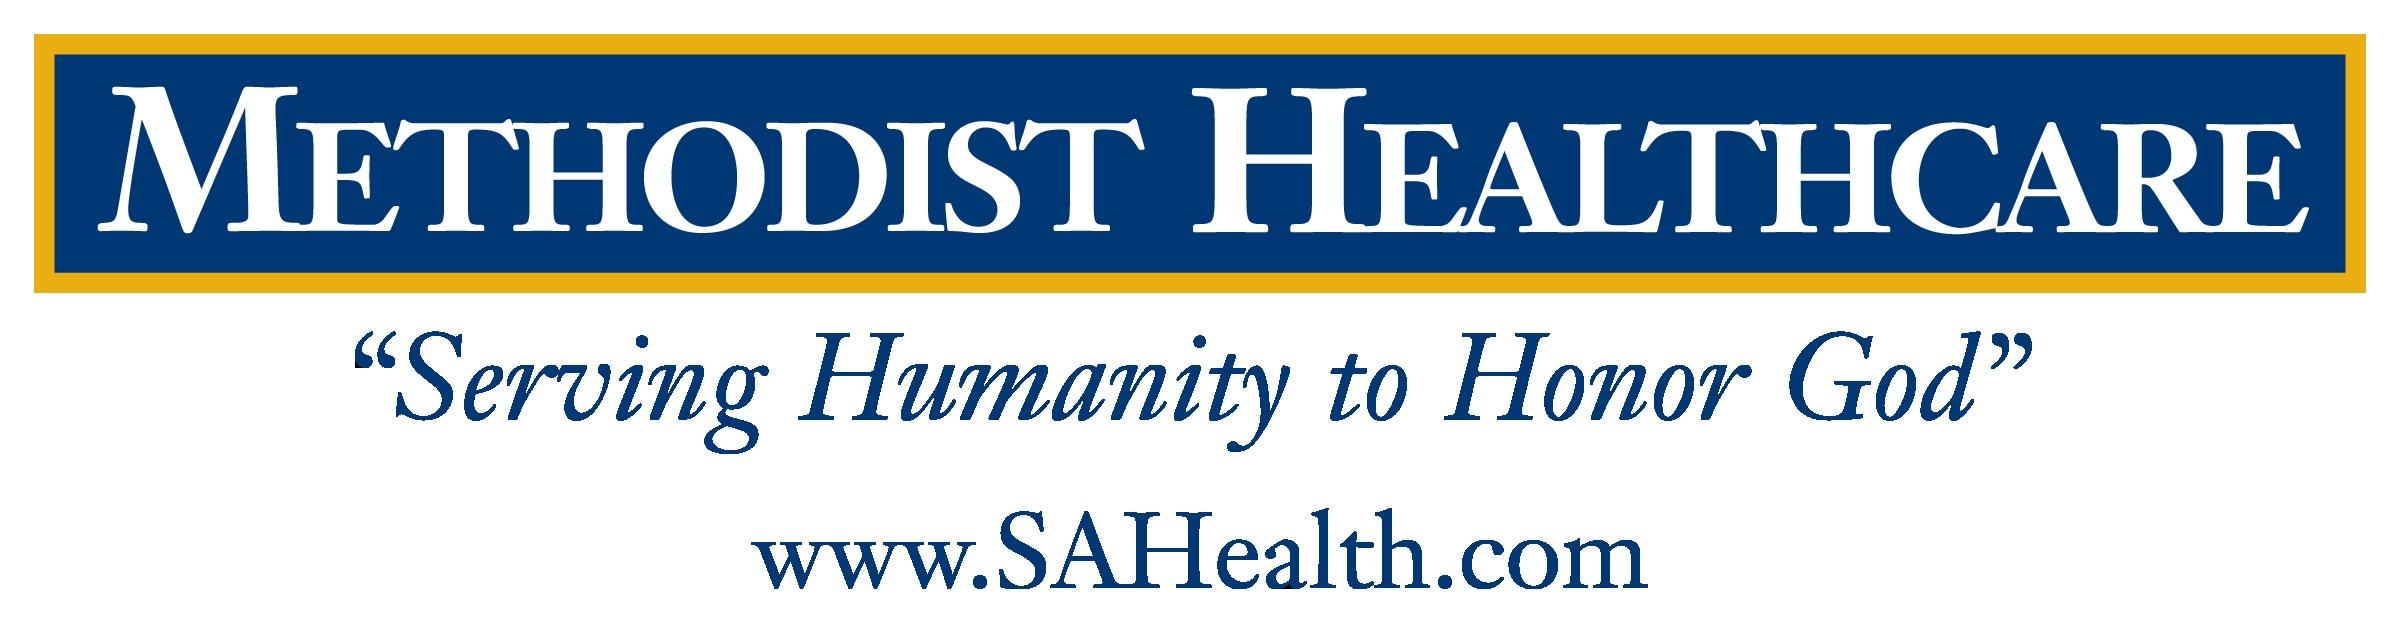 Methodist Healthcare System logo